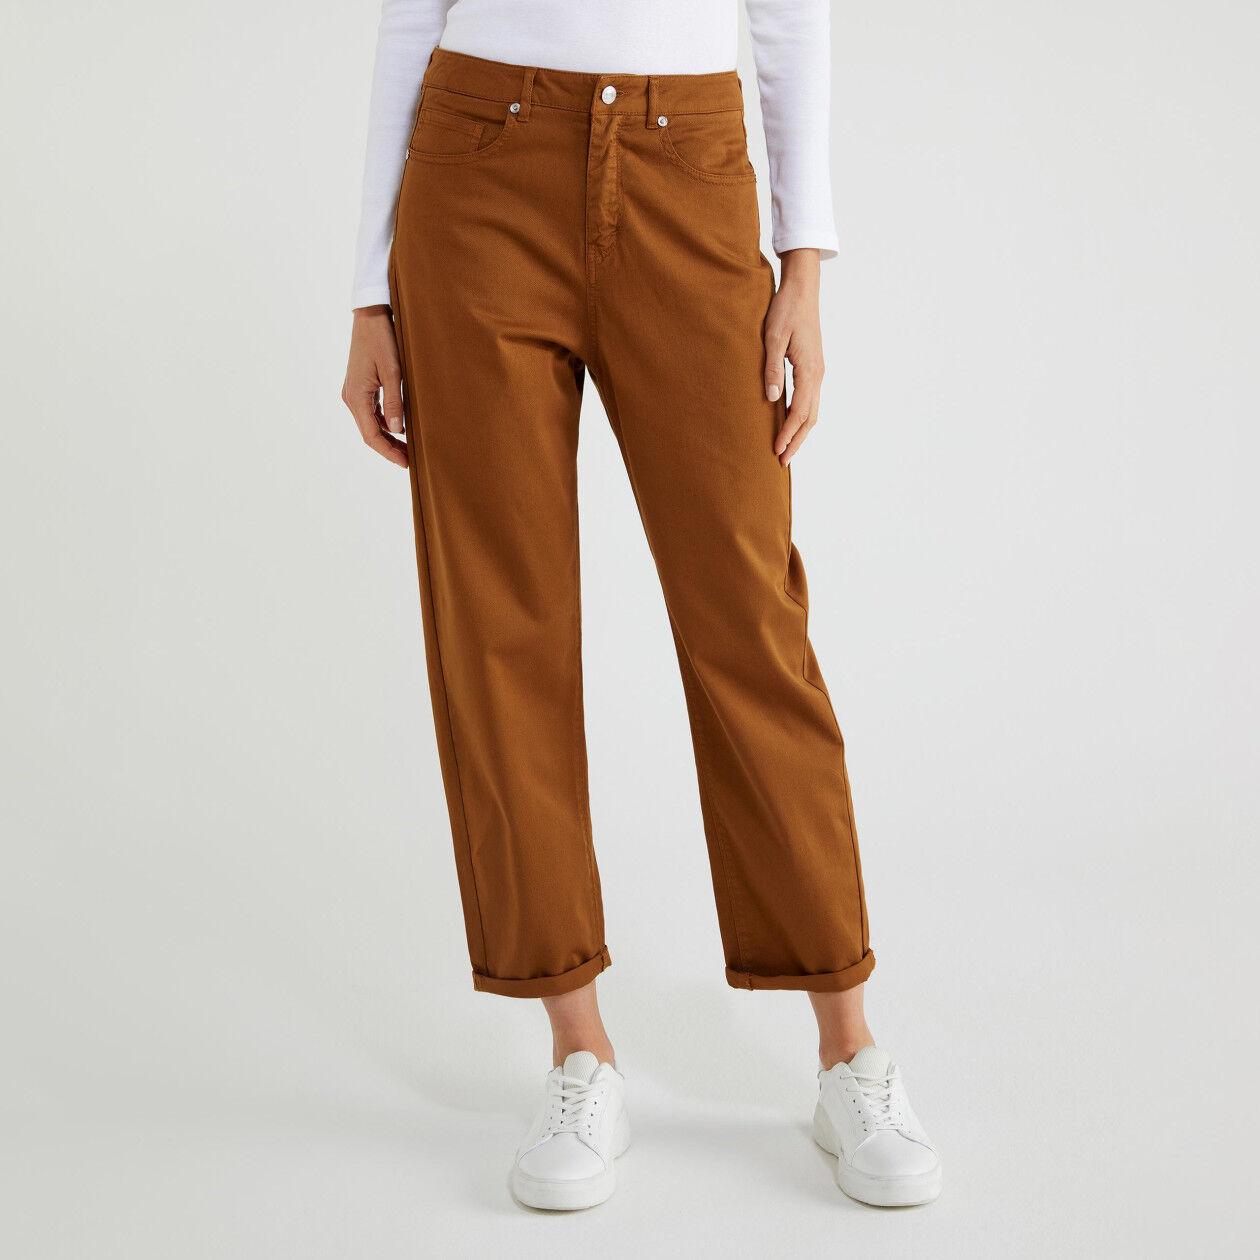 Pantaloni di cotone stretch